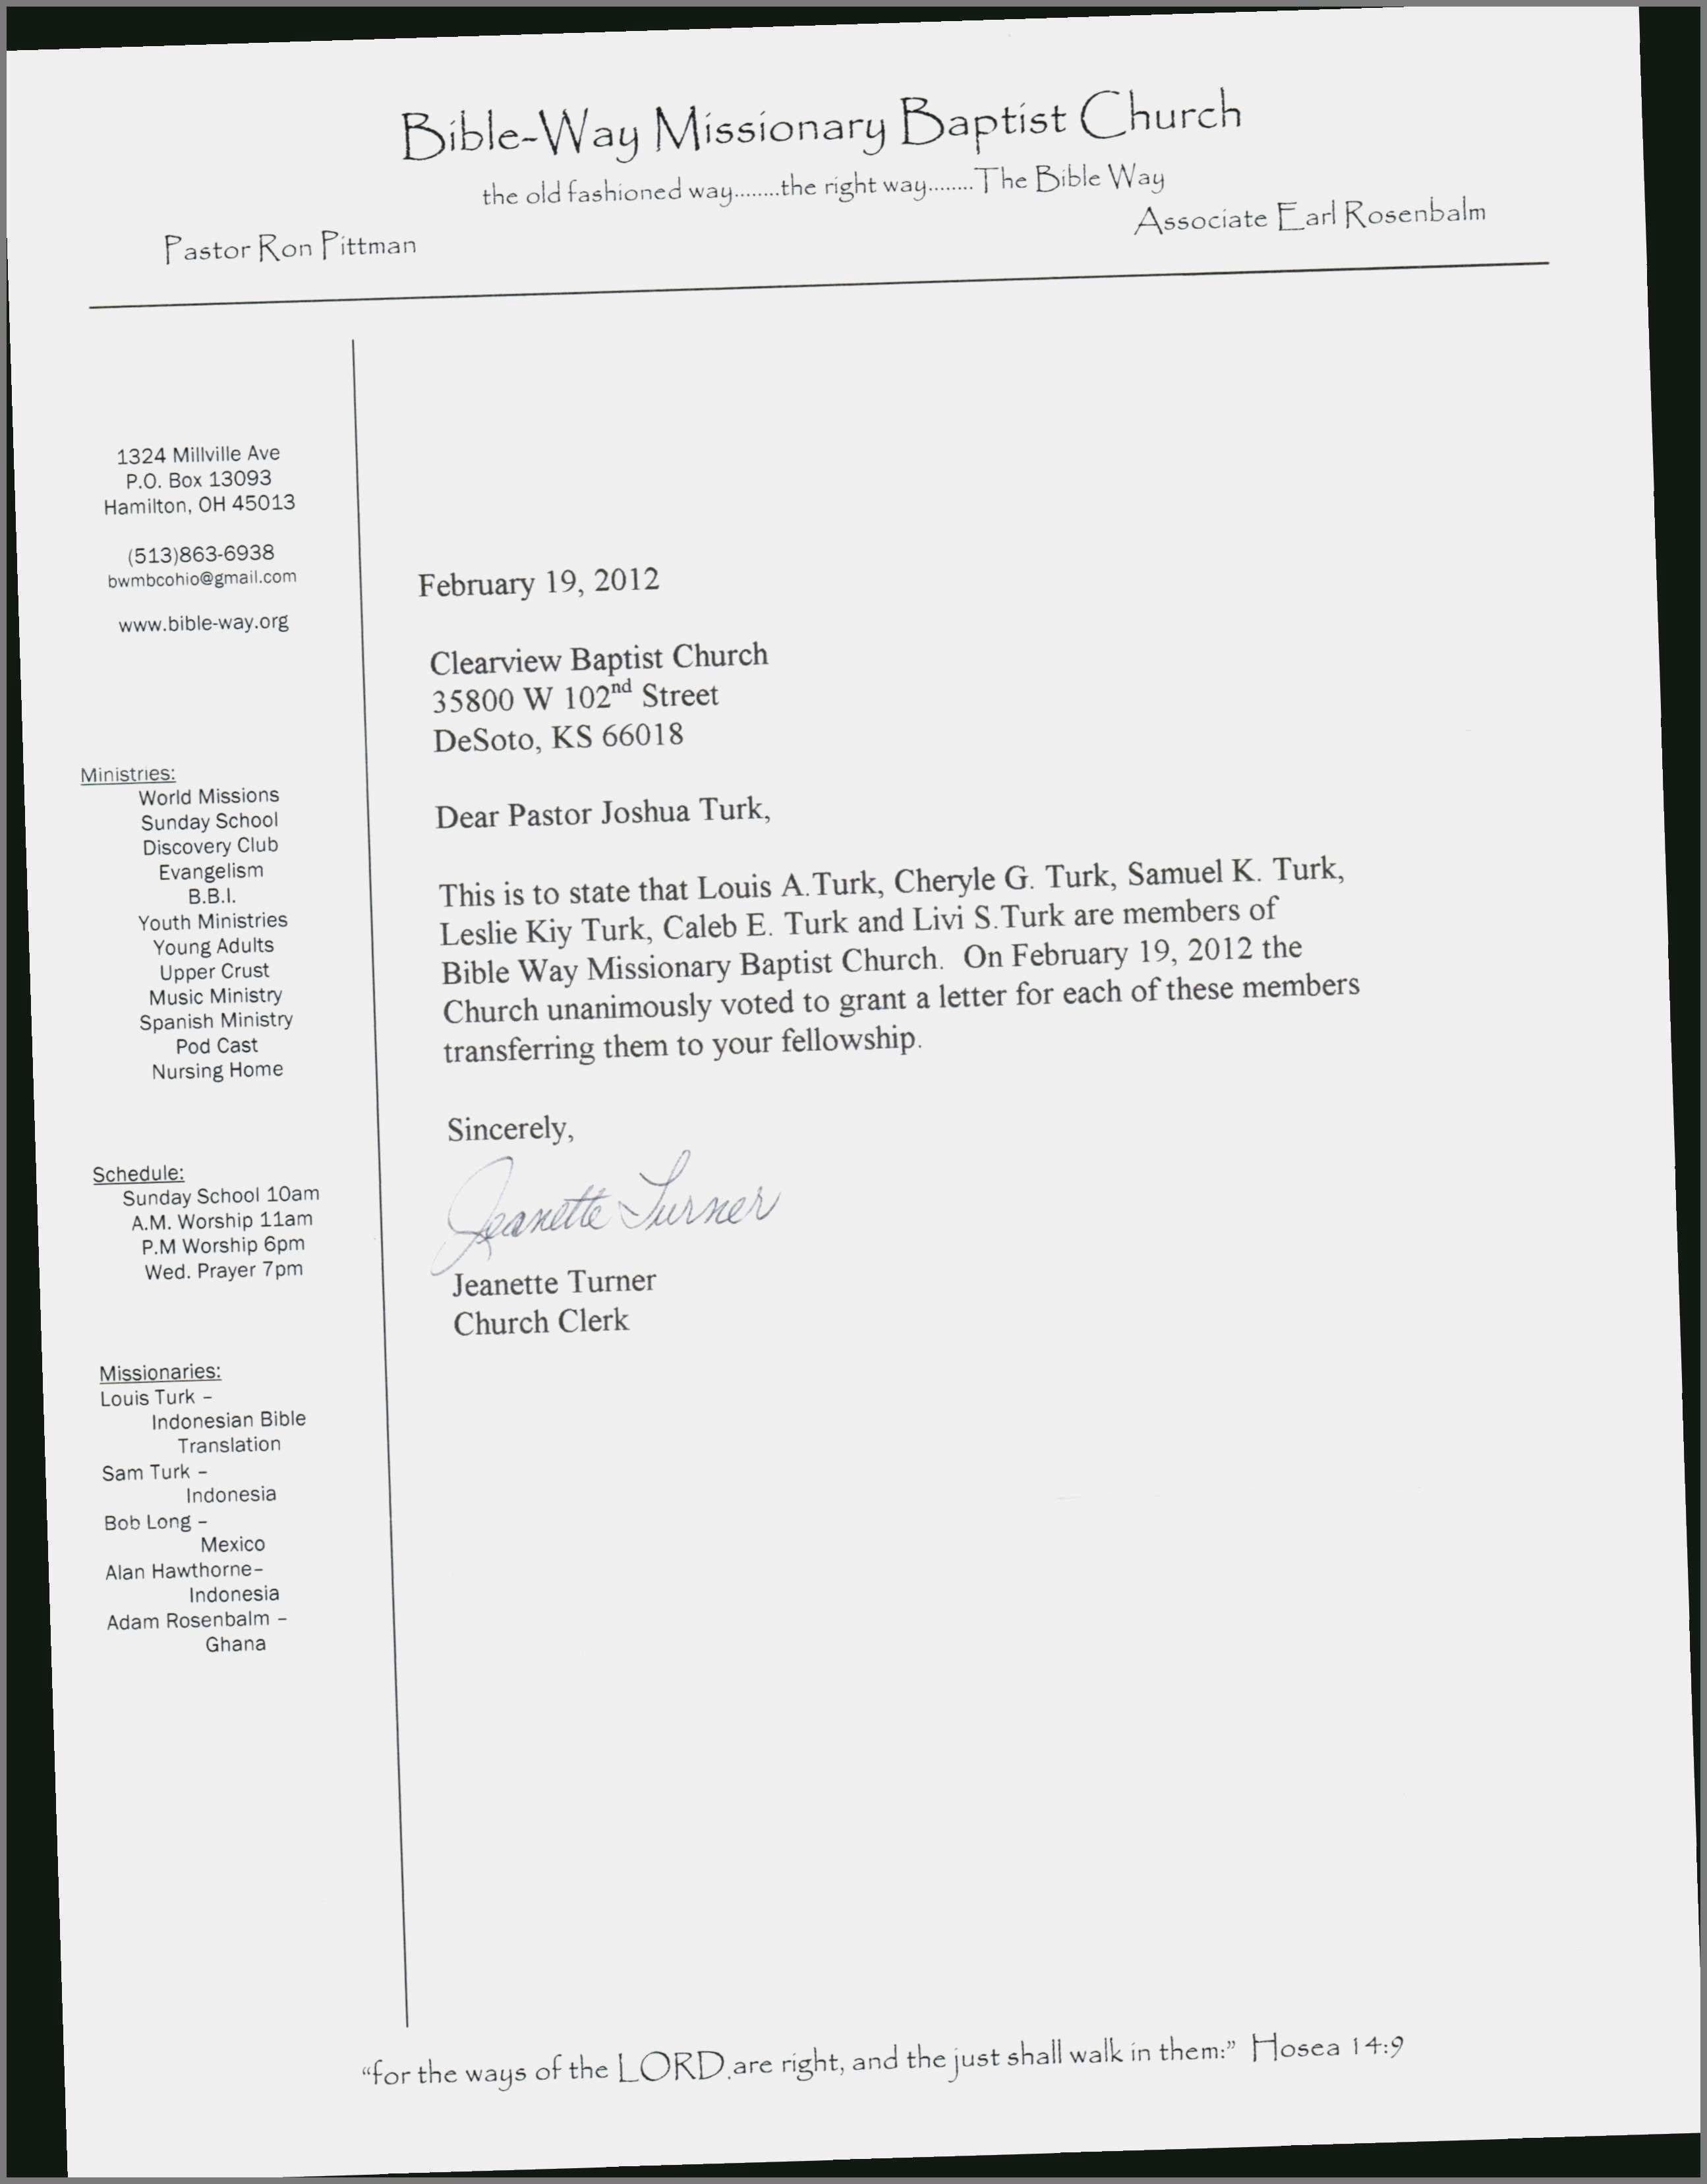 Church Membership Transfer Letter 14 Aesthetic Churches In Desoto Tx